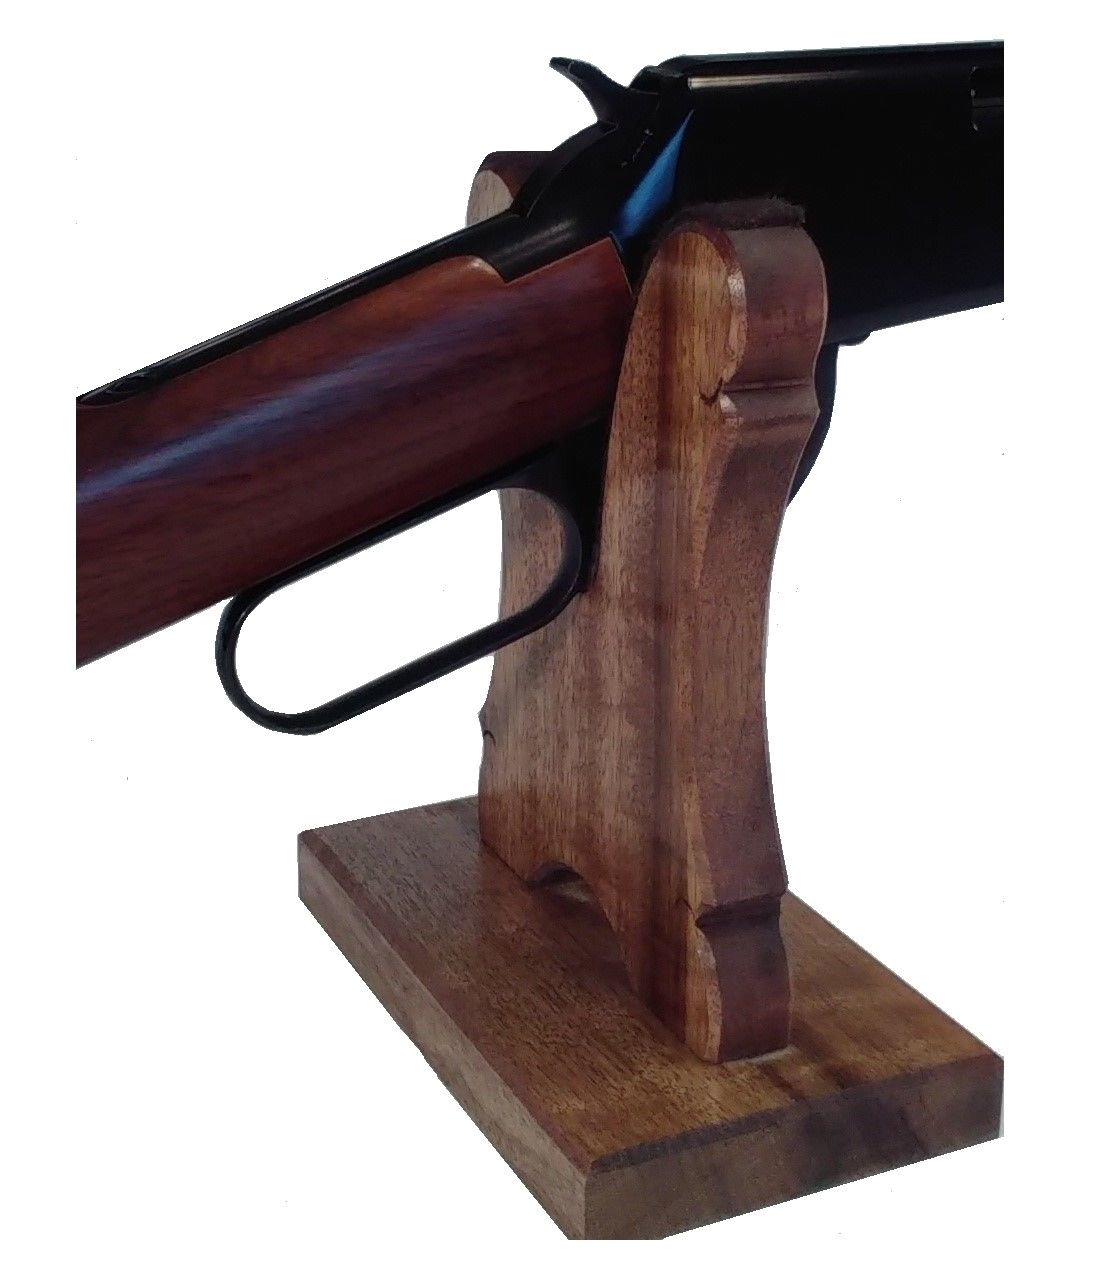 oak gun rack stand presentation table top display rifle shotgun lever ebay